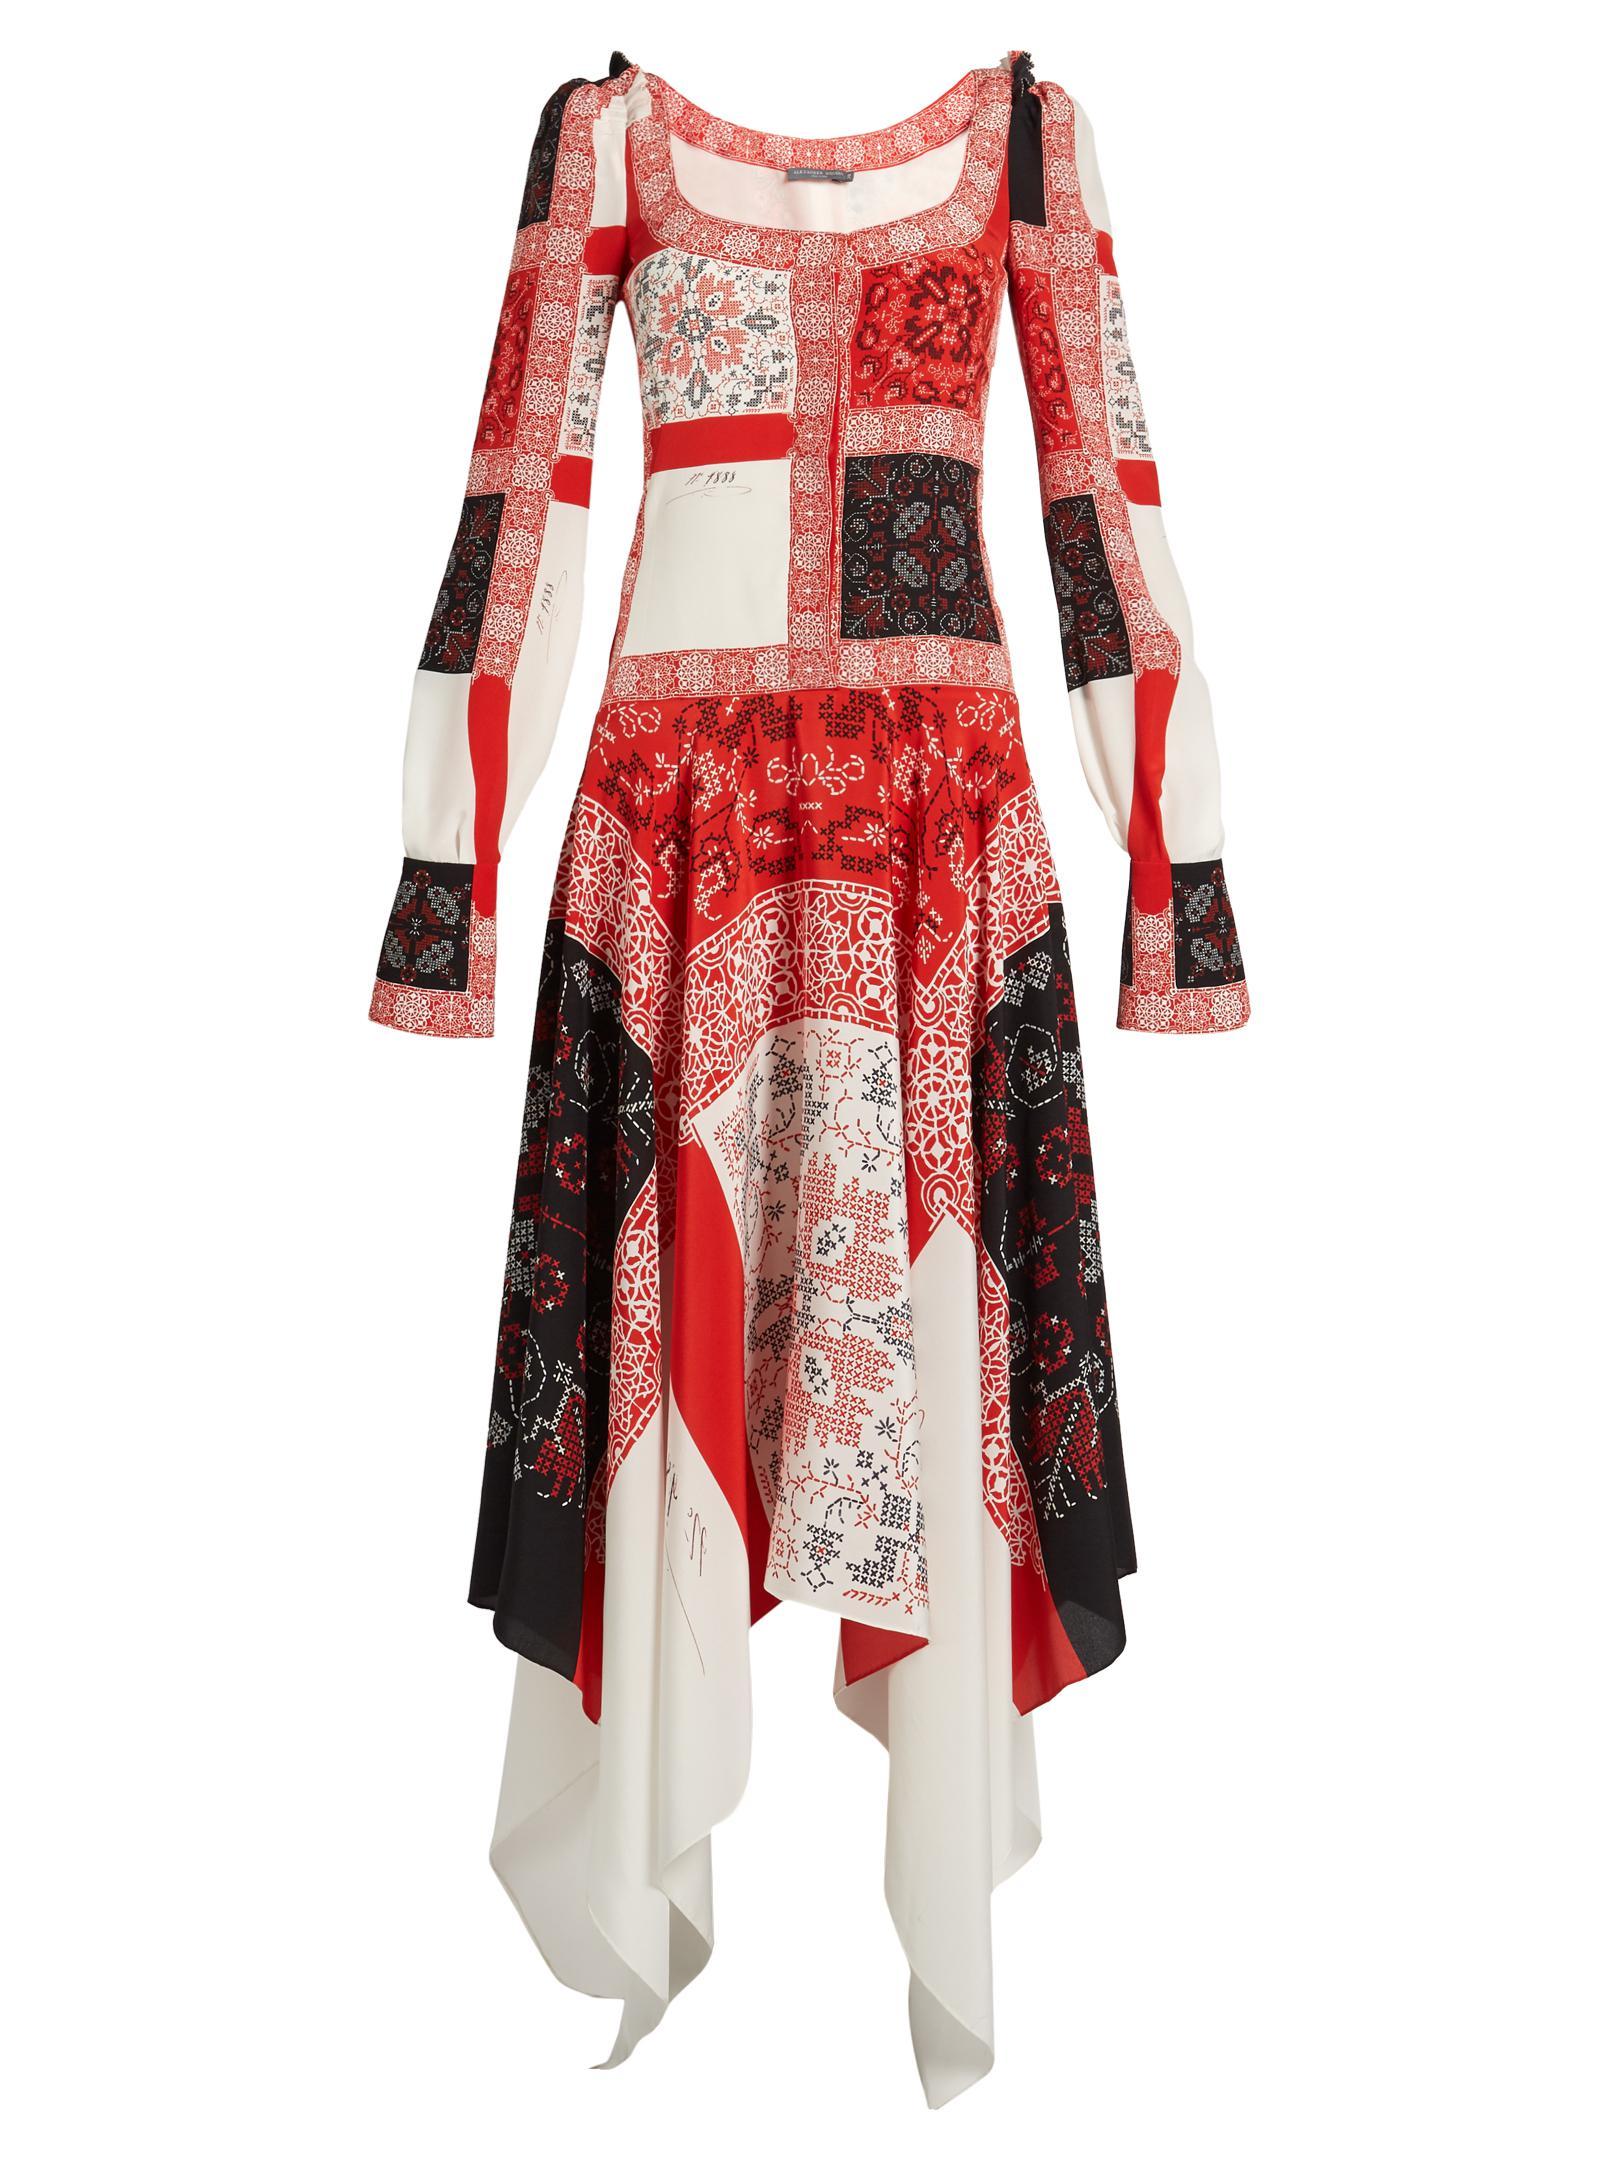 Scoop-neck cross-stitch print crepe de Chine dress Alexander McQueen yViL9nD9q